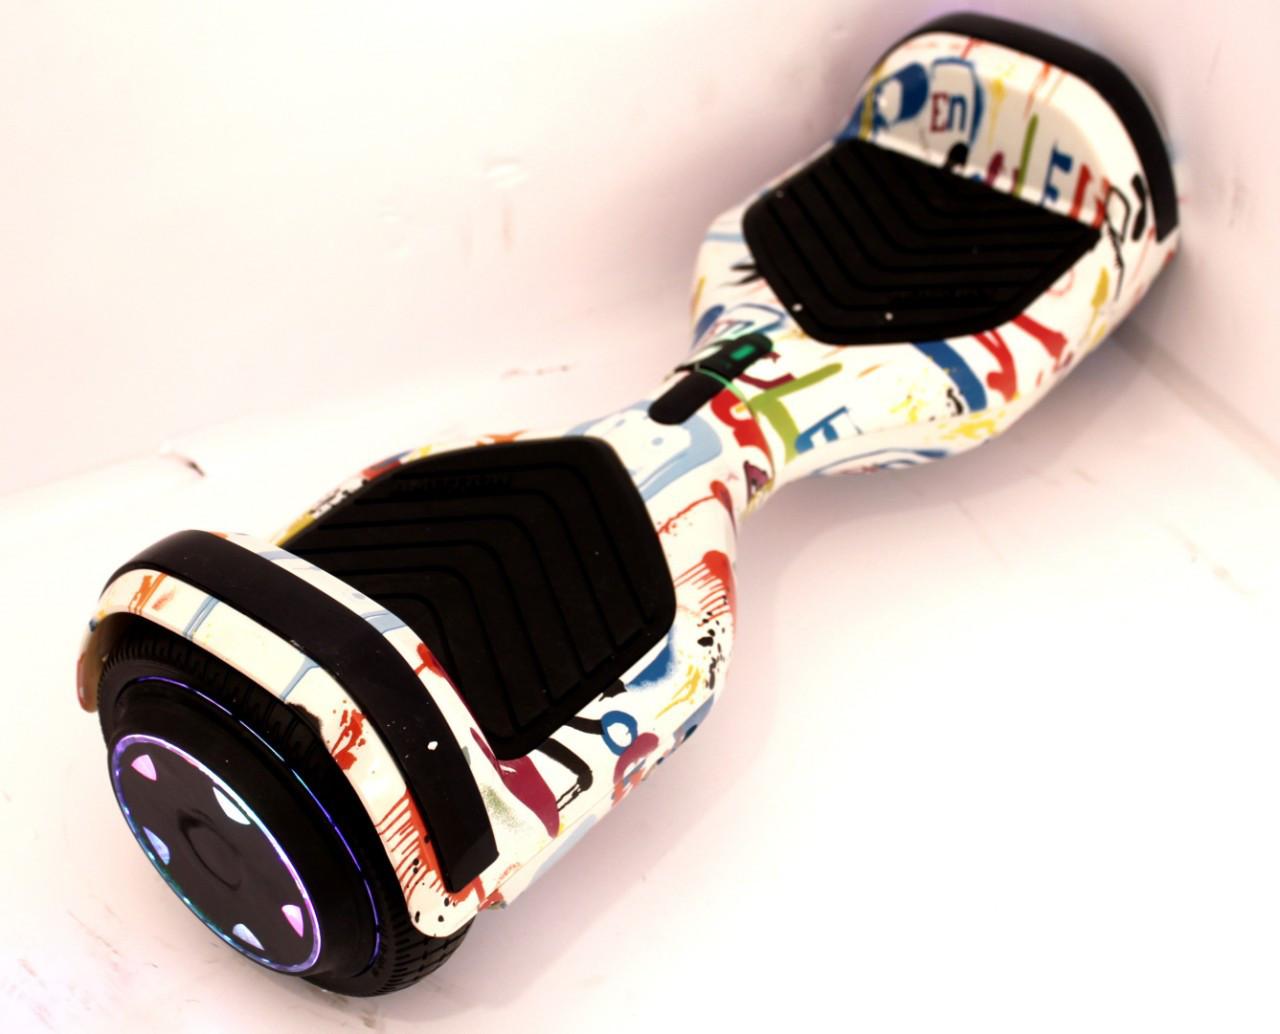 Белый Smart Balance Small 6.5 дюйм Гироскутер с подсветкой колес Самобаланс ТАО Bluetooth колонки